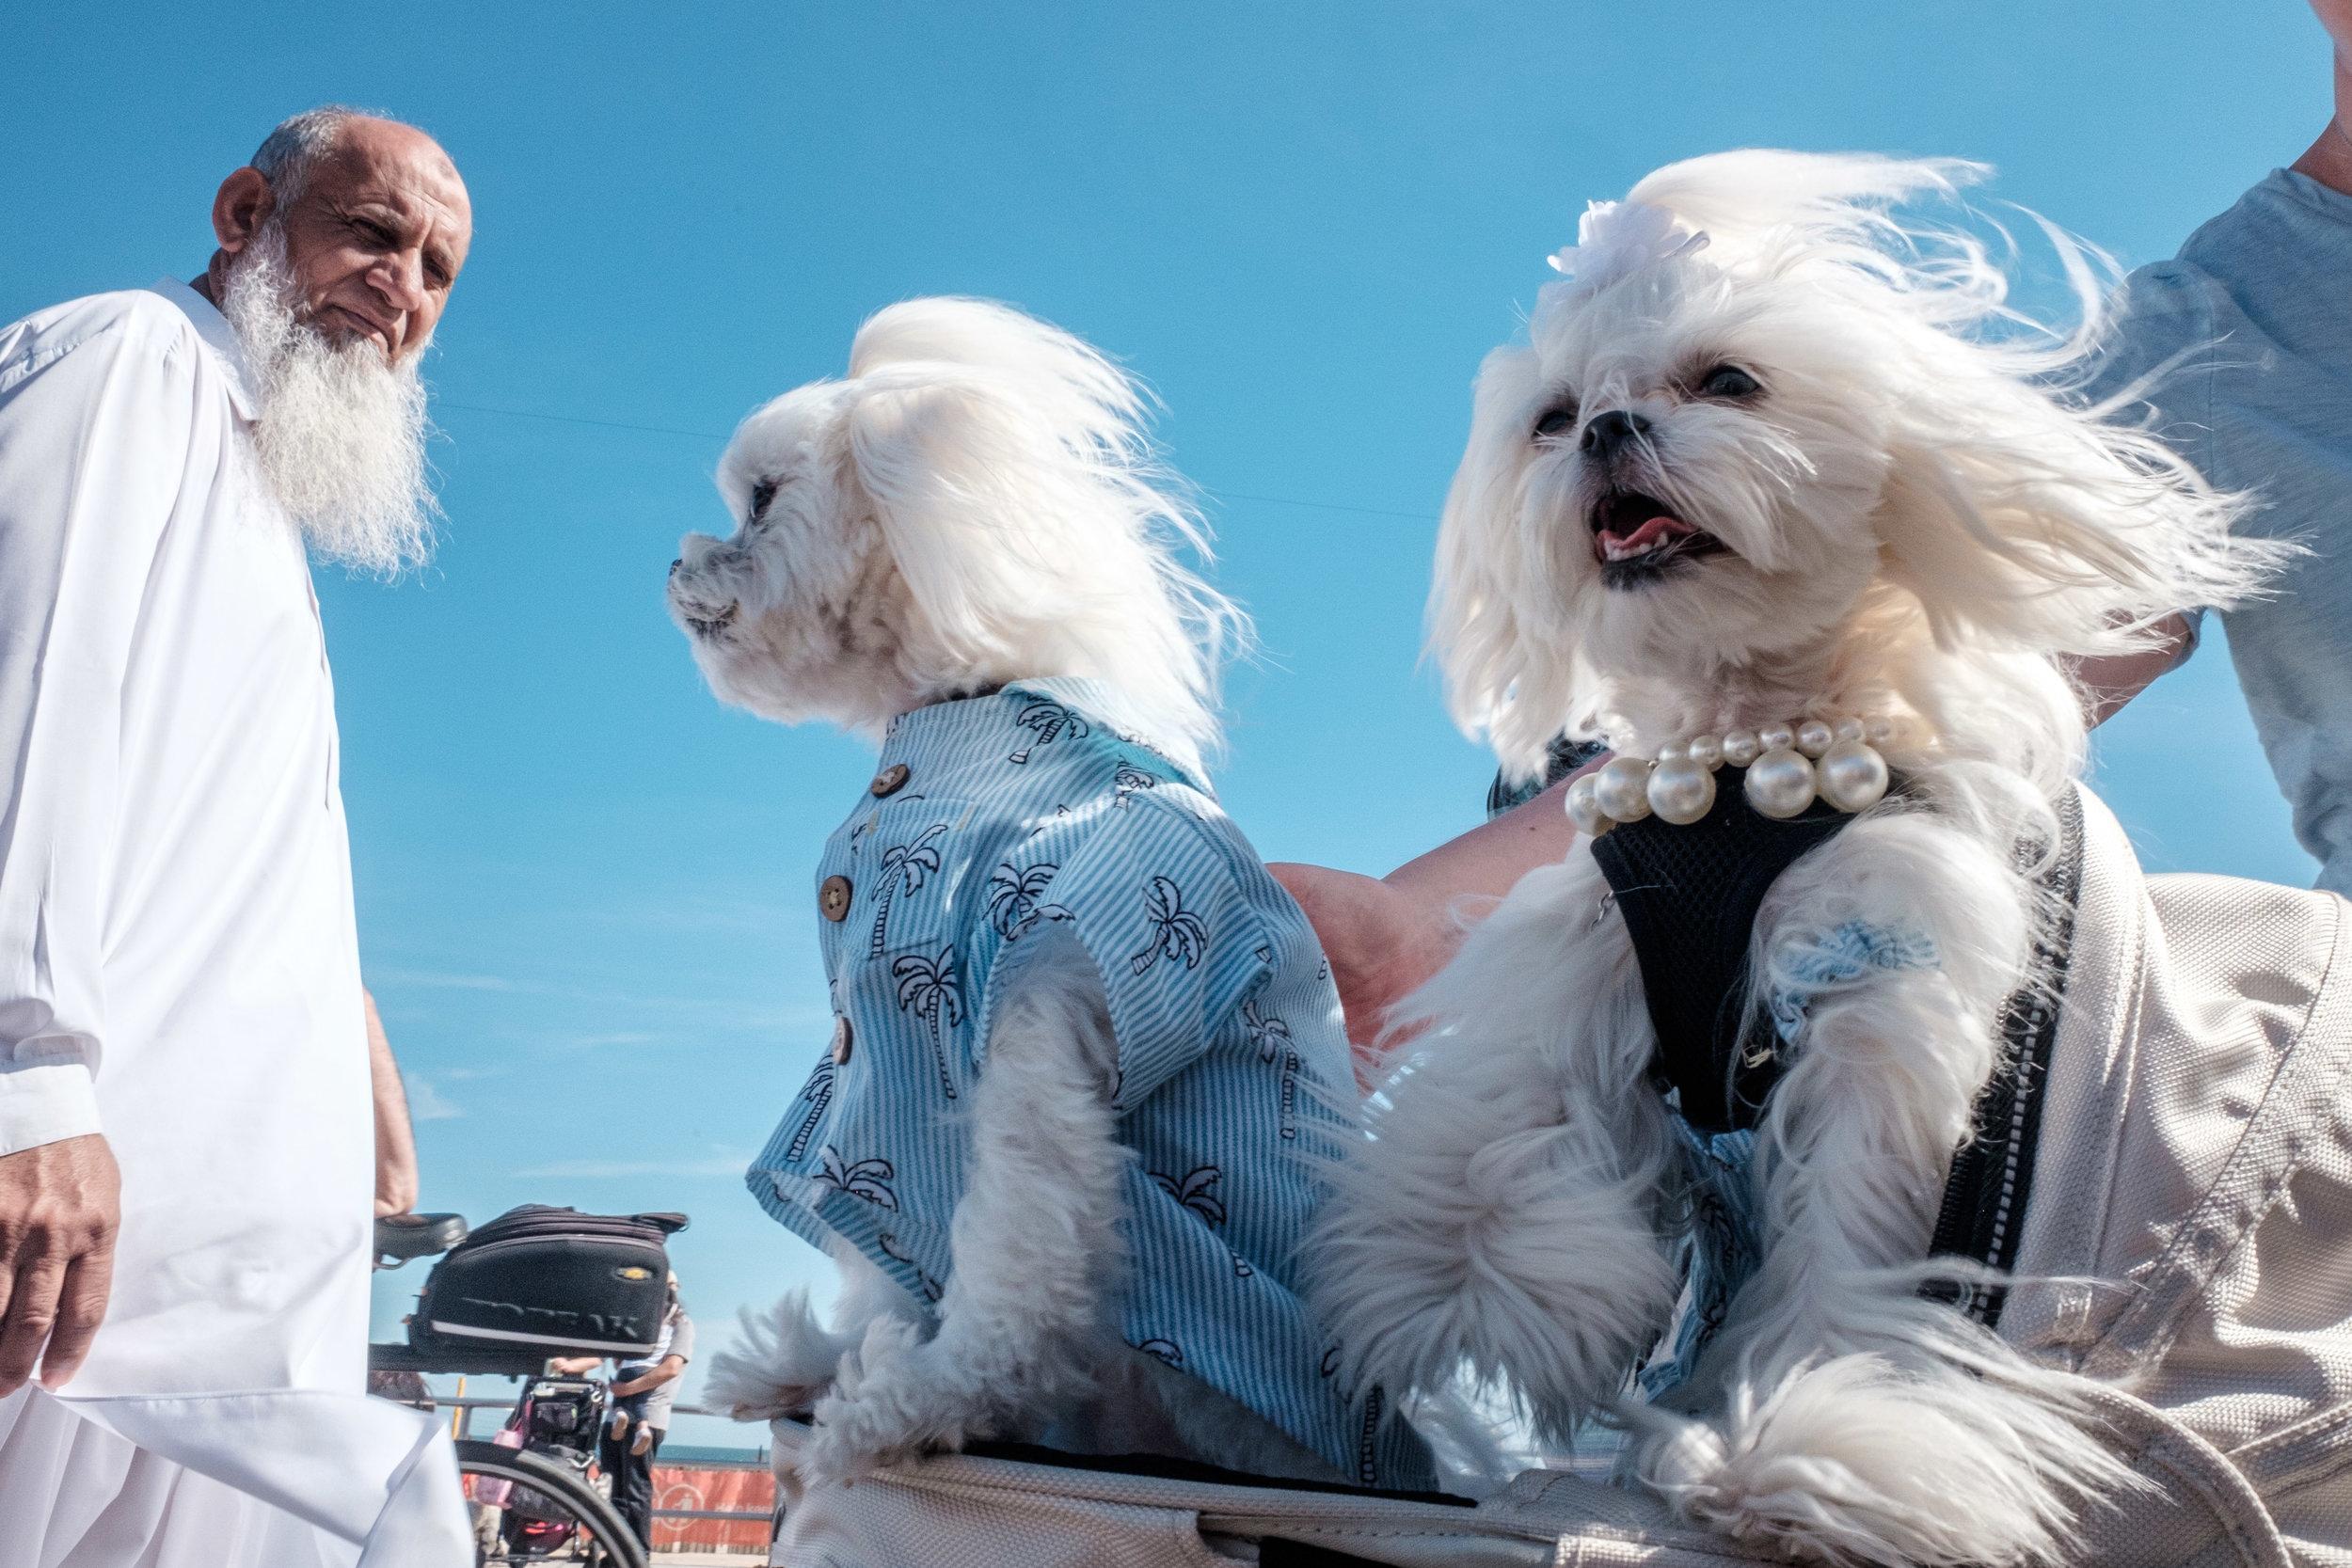 whitebearddogs.jpg